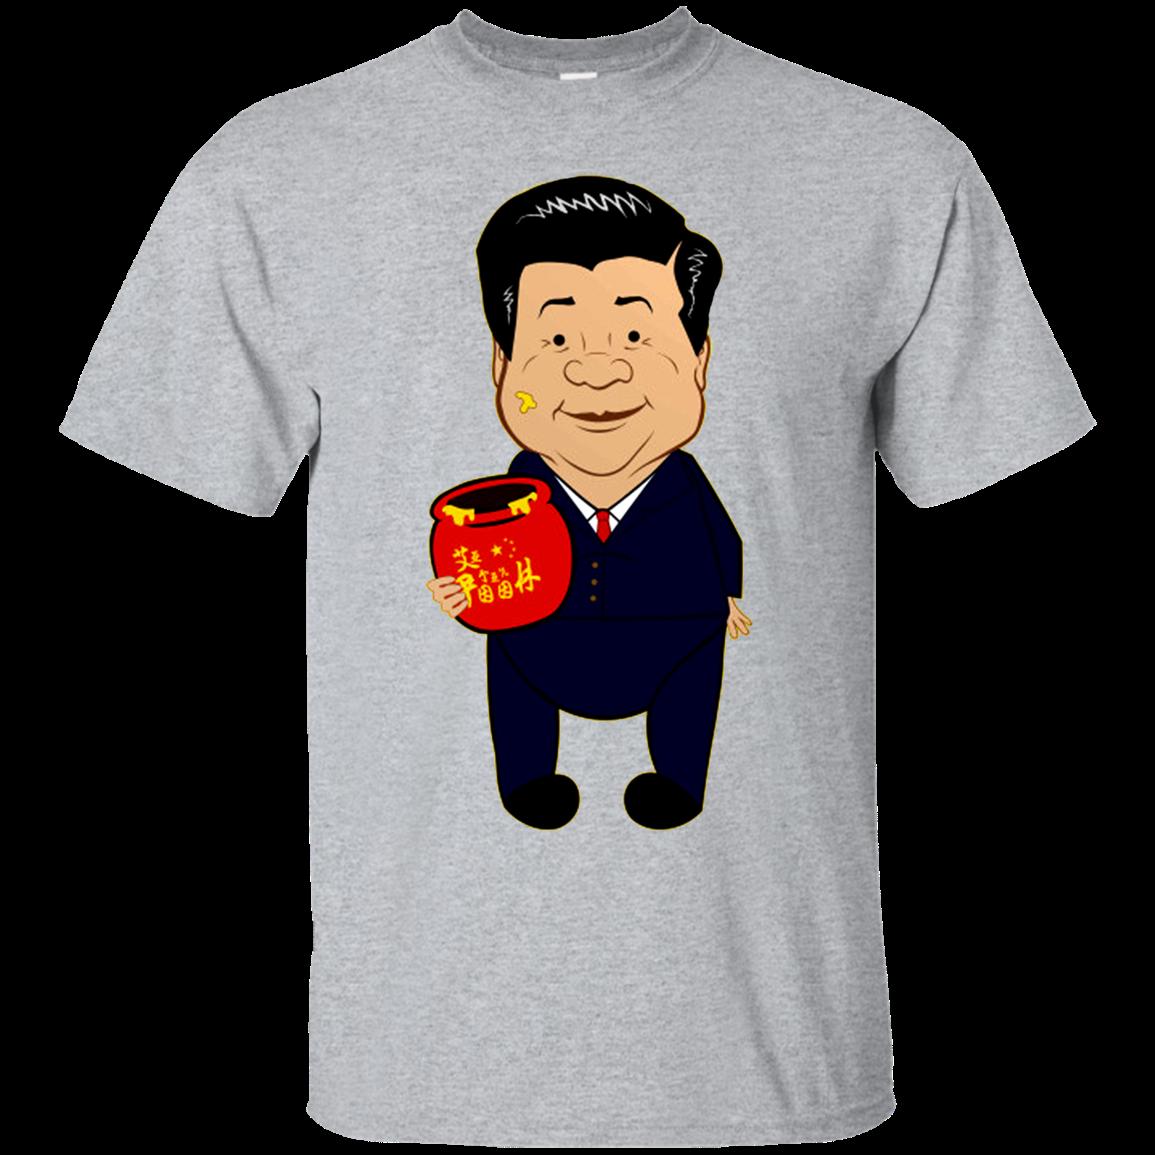 Xi Jinping Winnie The Pooh Shirt G200 Ultra T Shirt